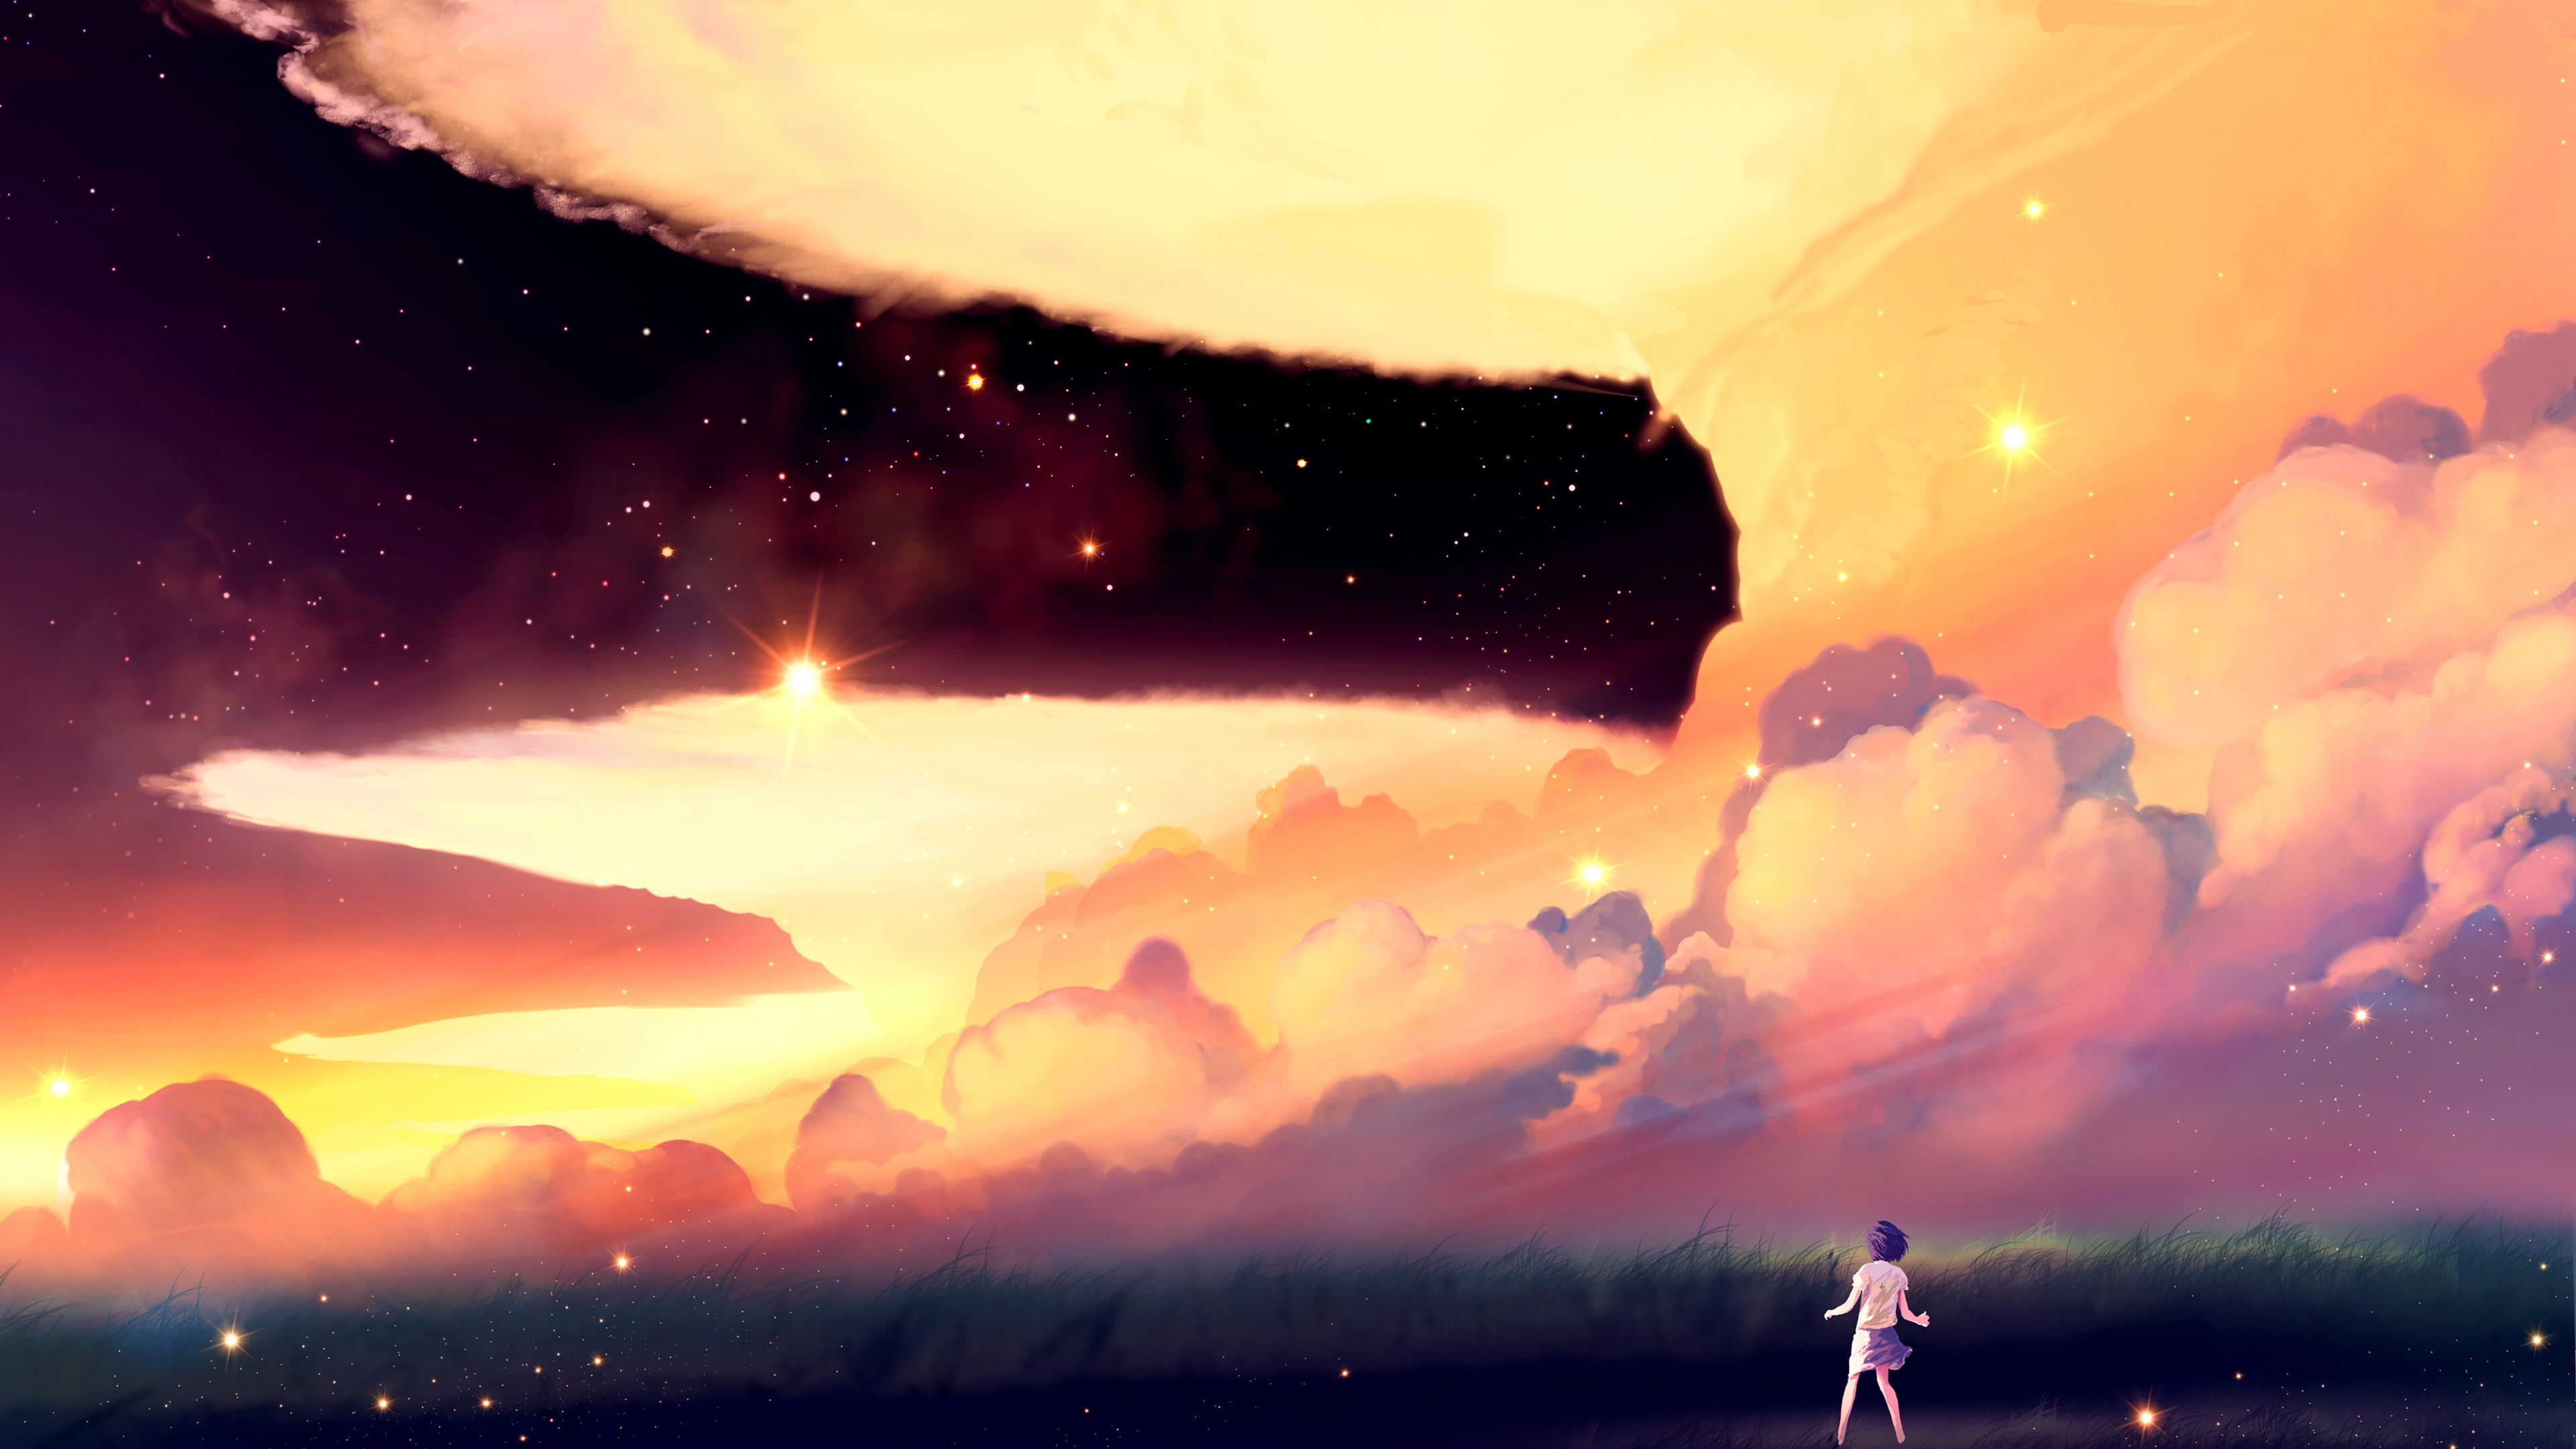 akio bako anime sunset girl clouds 4k 1541976032 - akio bako, anime, sunset, girl, clouds 4k - sunset, Anime, akio bako